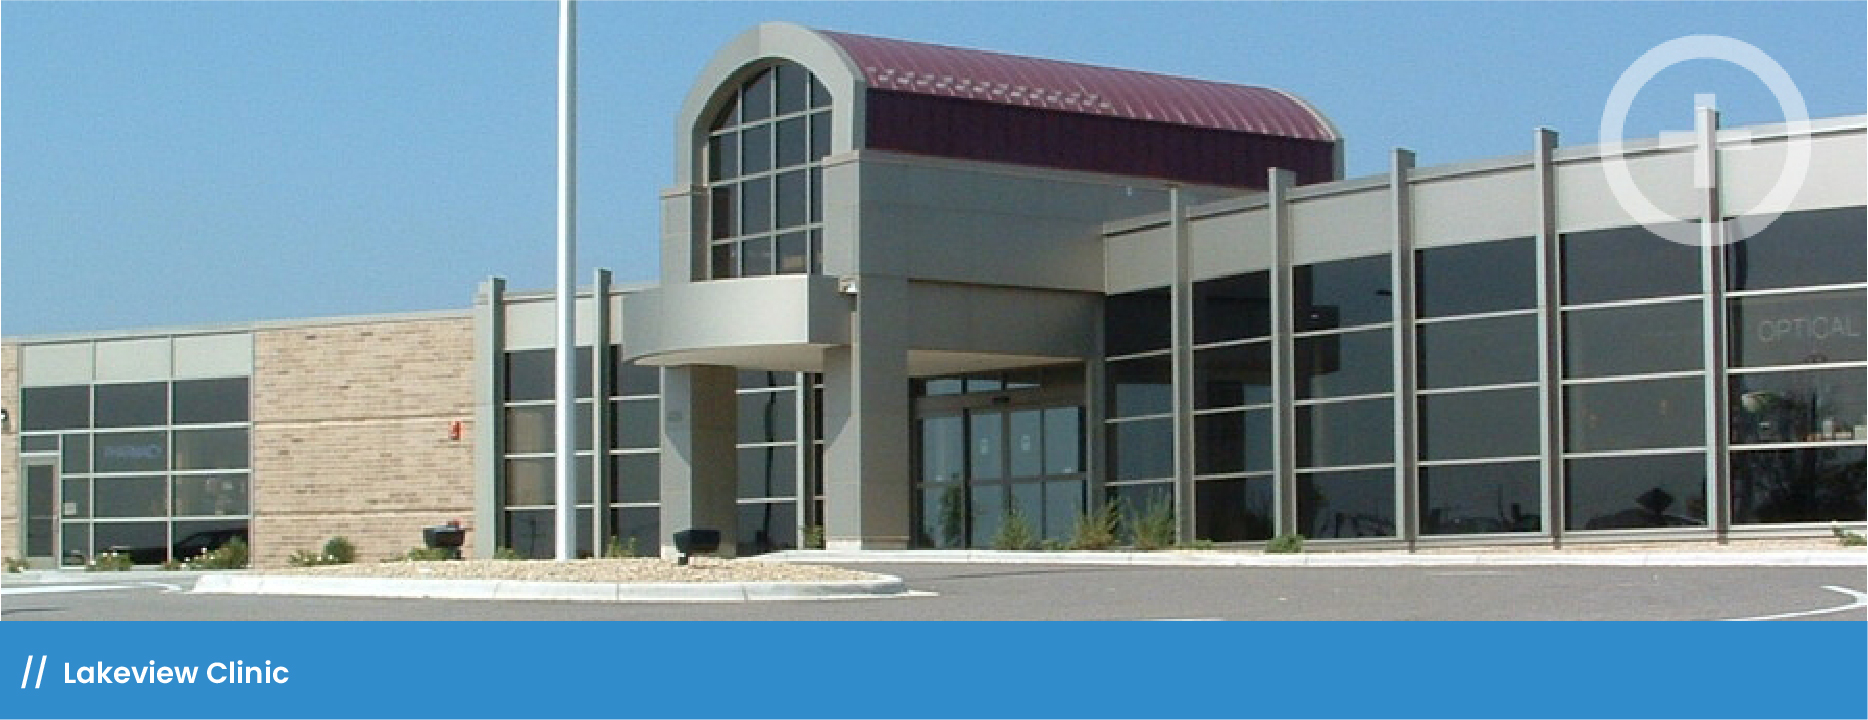 Yanik-Watermark_ Lakeview Clinic